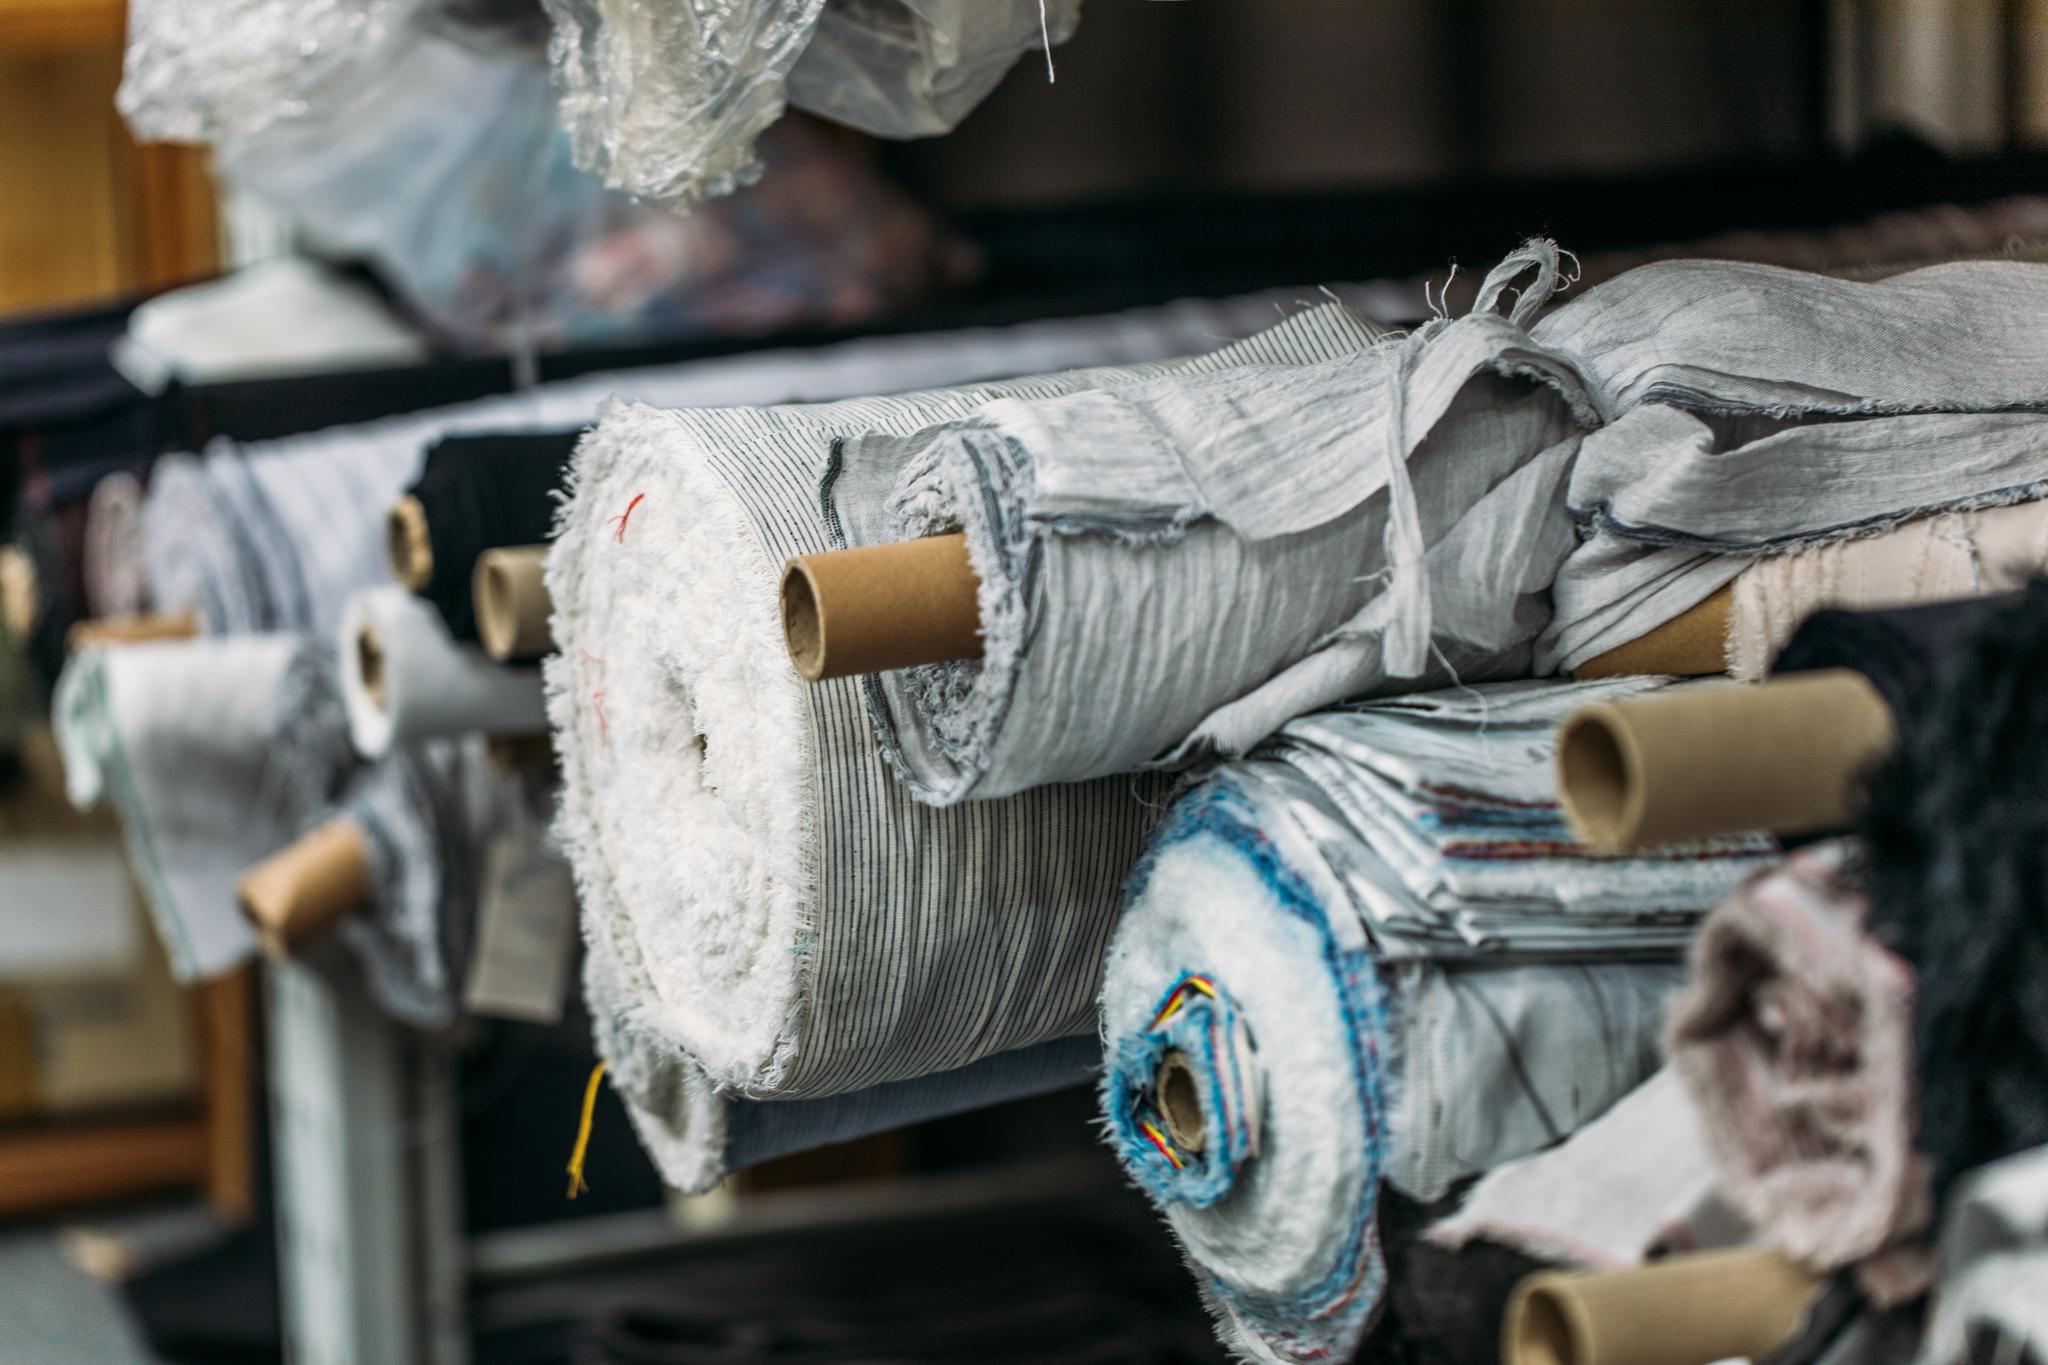 NZ Made Knitwear - Standard Issue